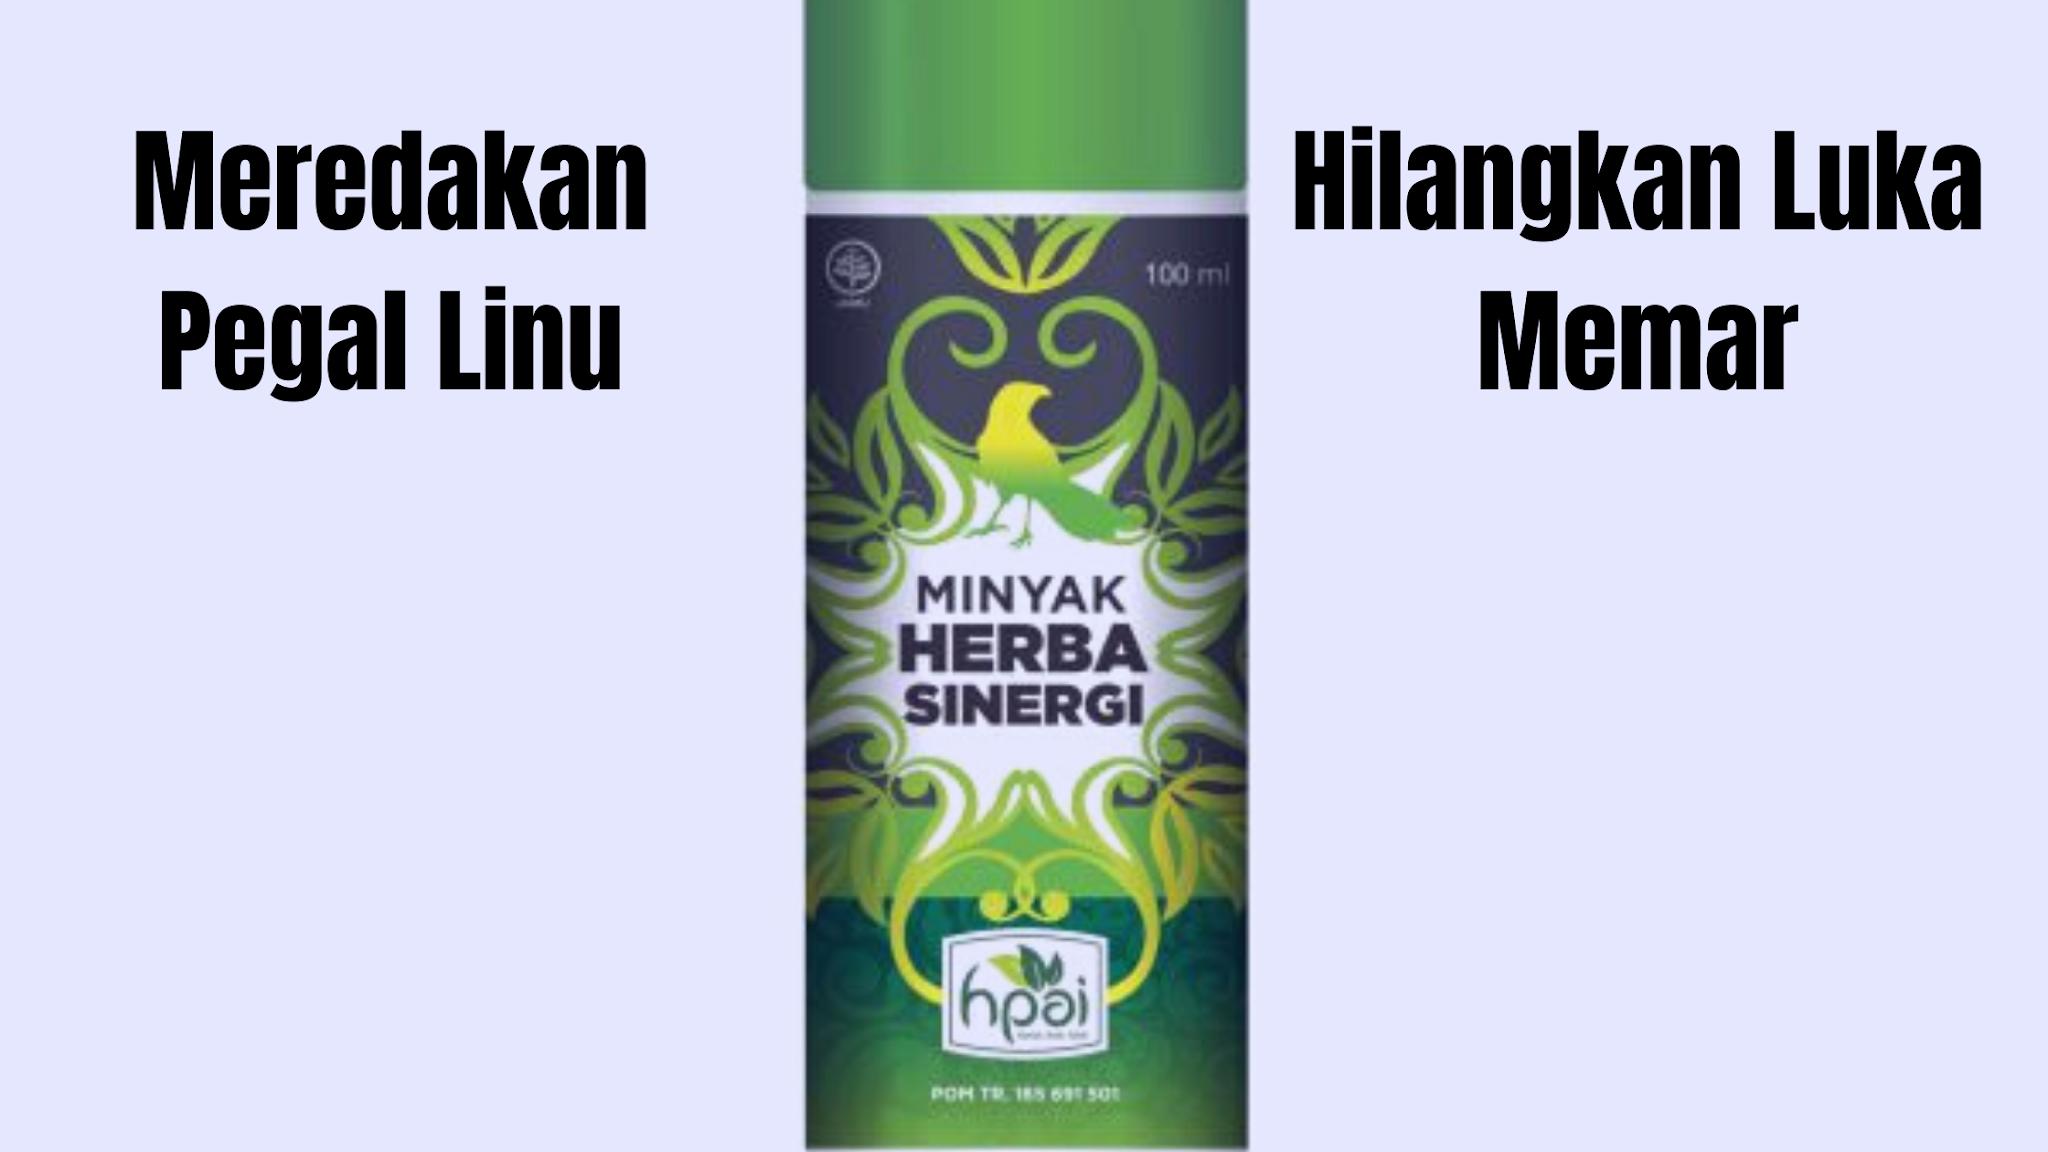 manfaat minyak herba sinergi